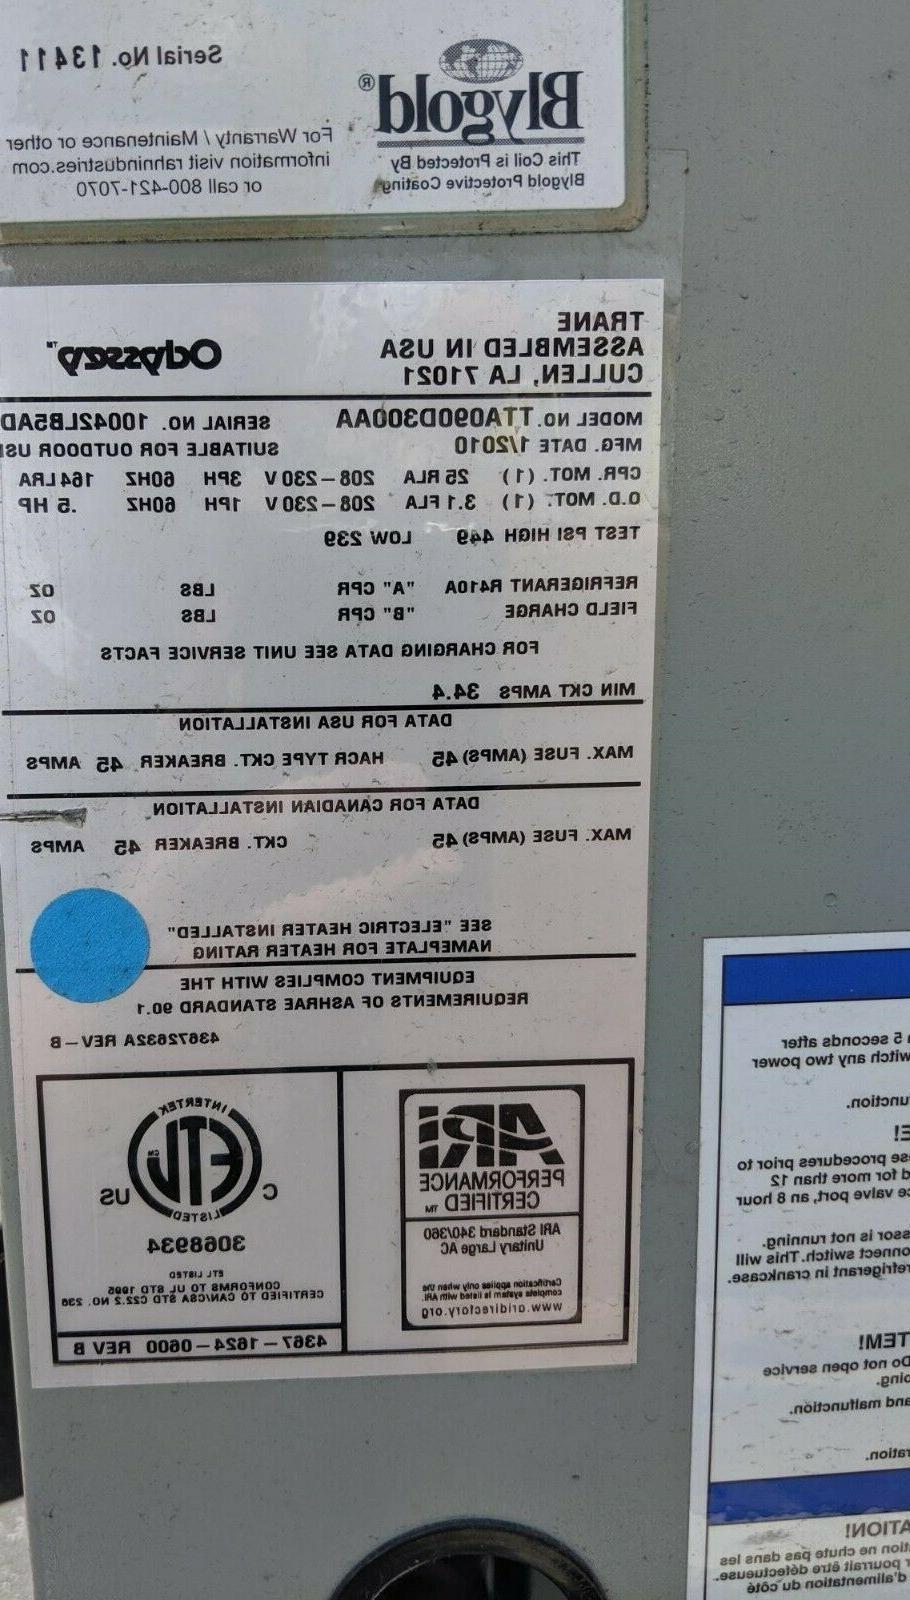 Trane split air conditioner 7.5Ton #TTA090D300A